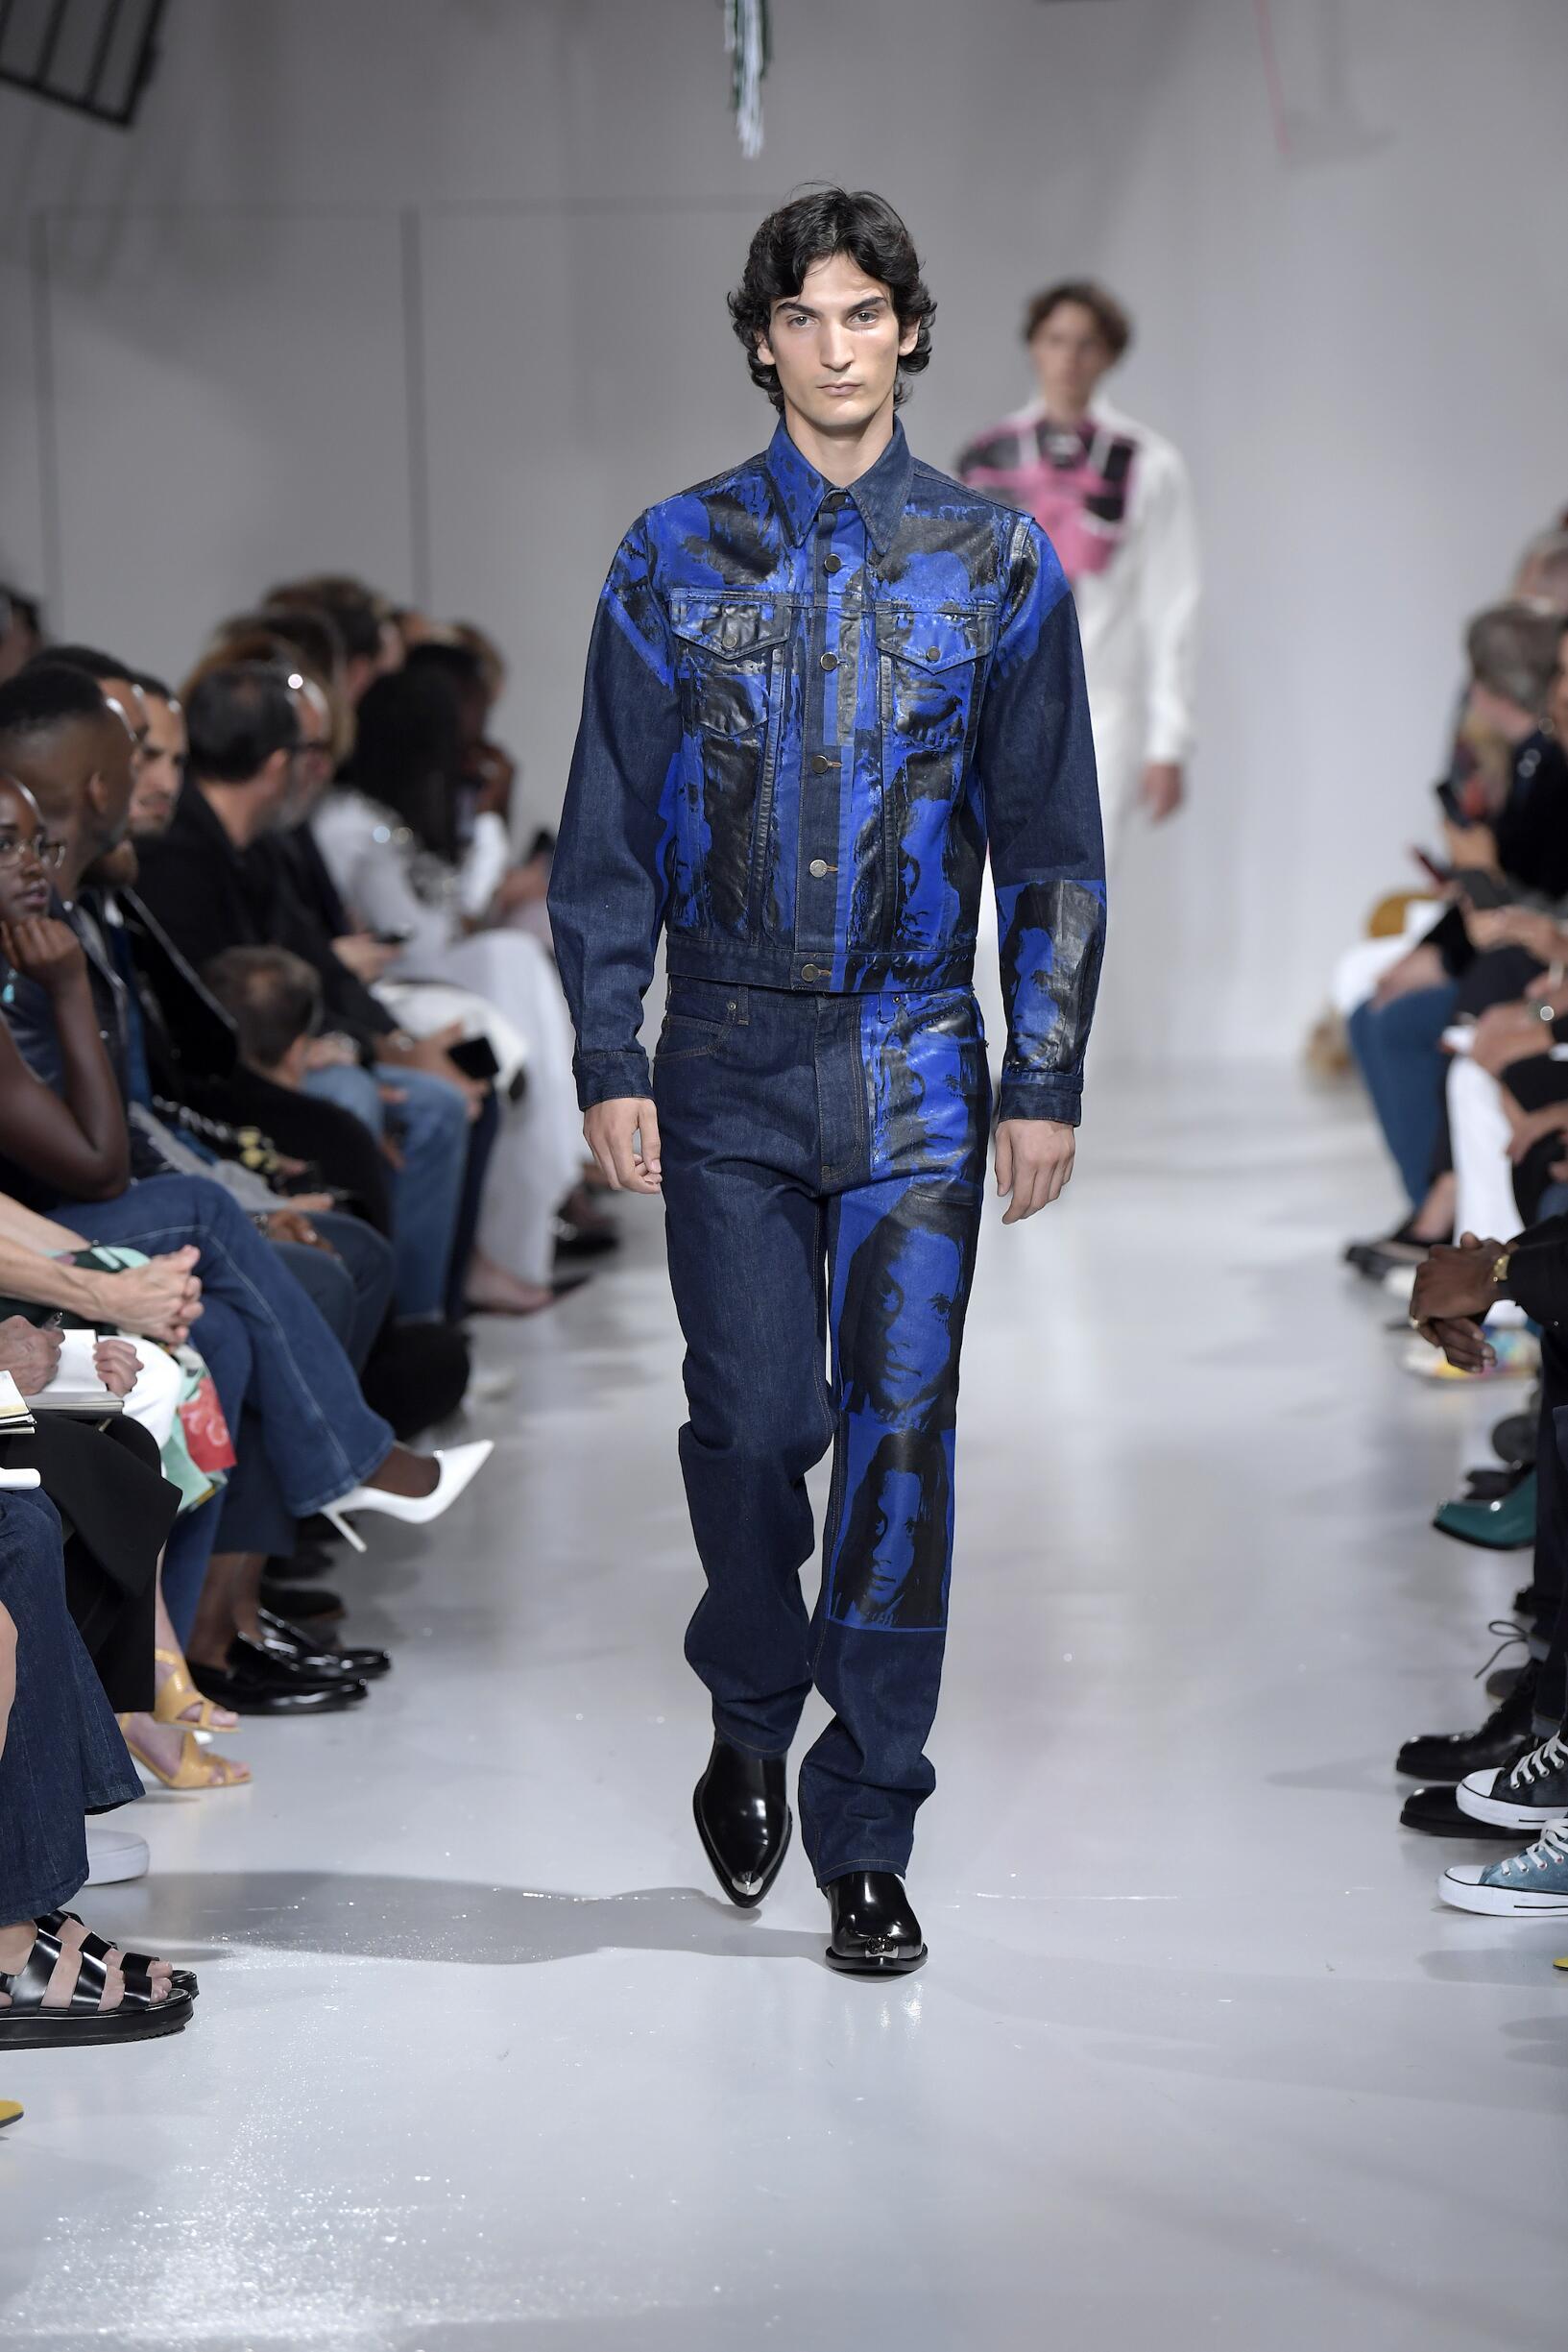 Calvin Klein 205W39NYC New York Fashion Week Menswear